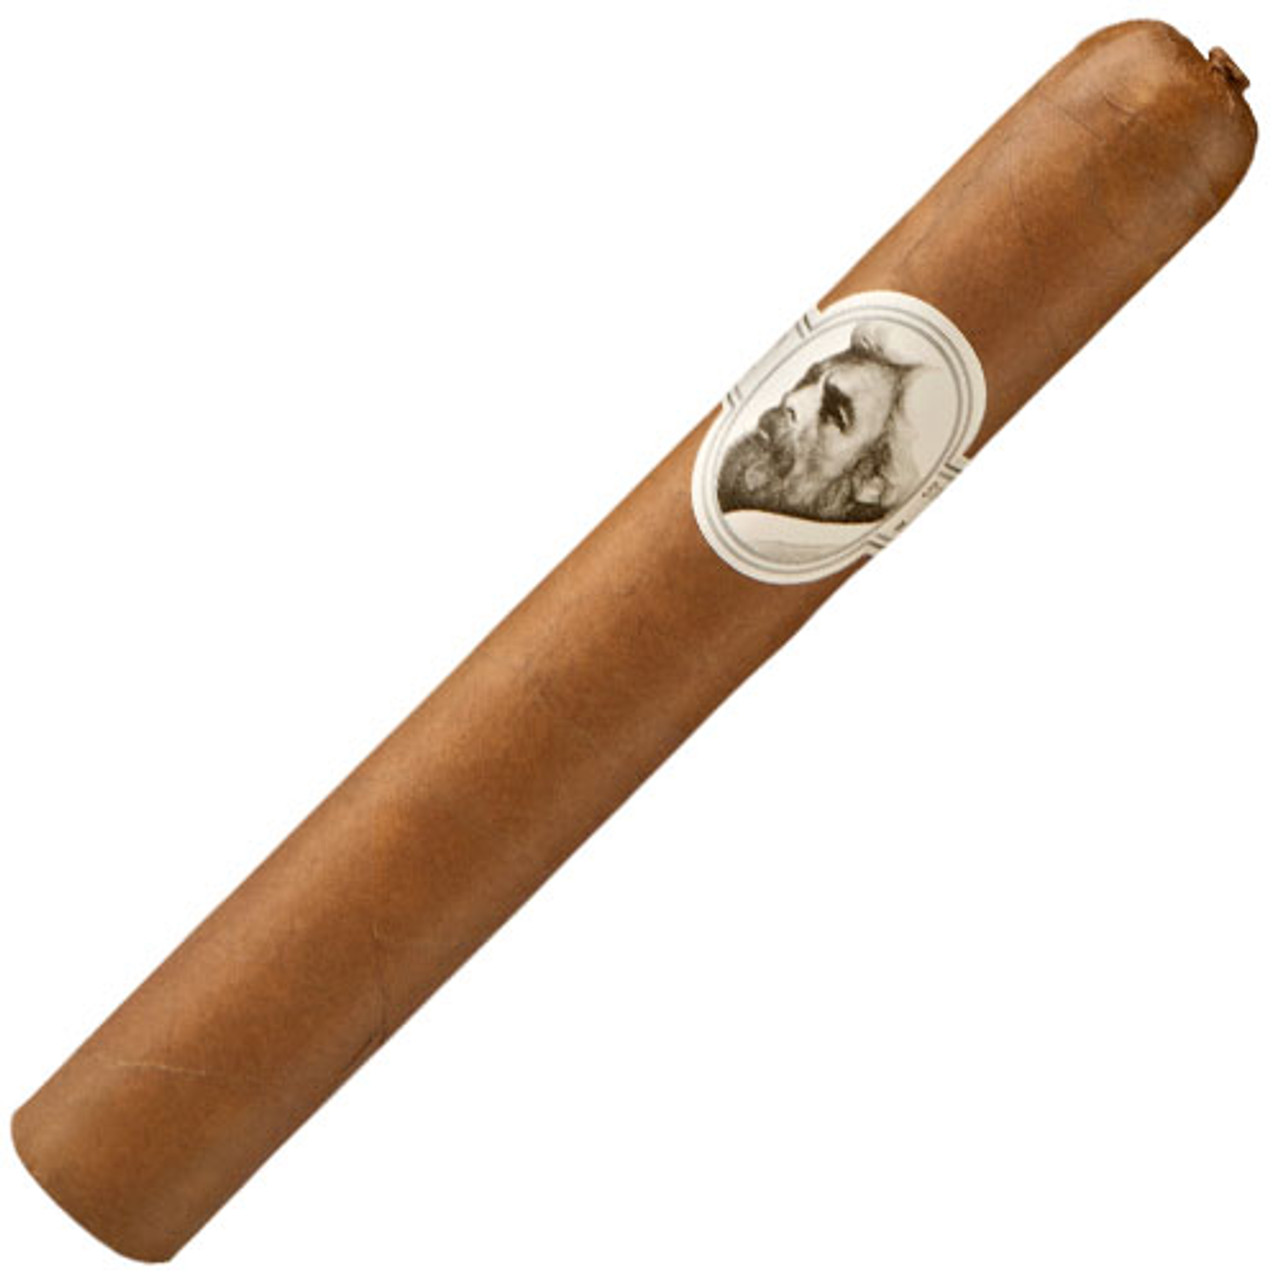 Caldwell Eastern Standard Cypress Room Super Toro Cigars - 6 x 50 (Box of 24)